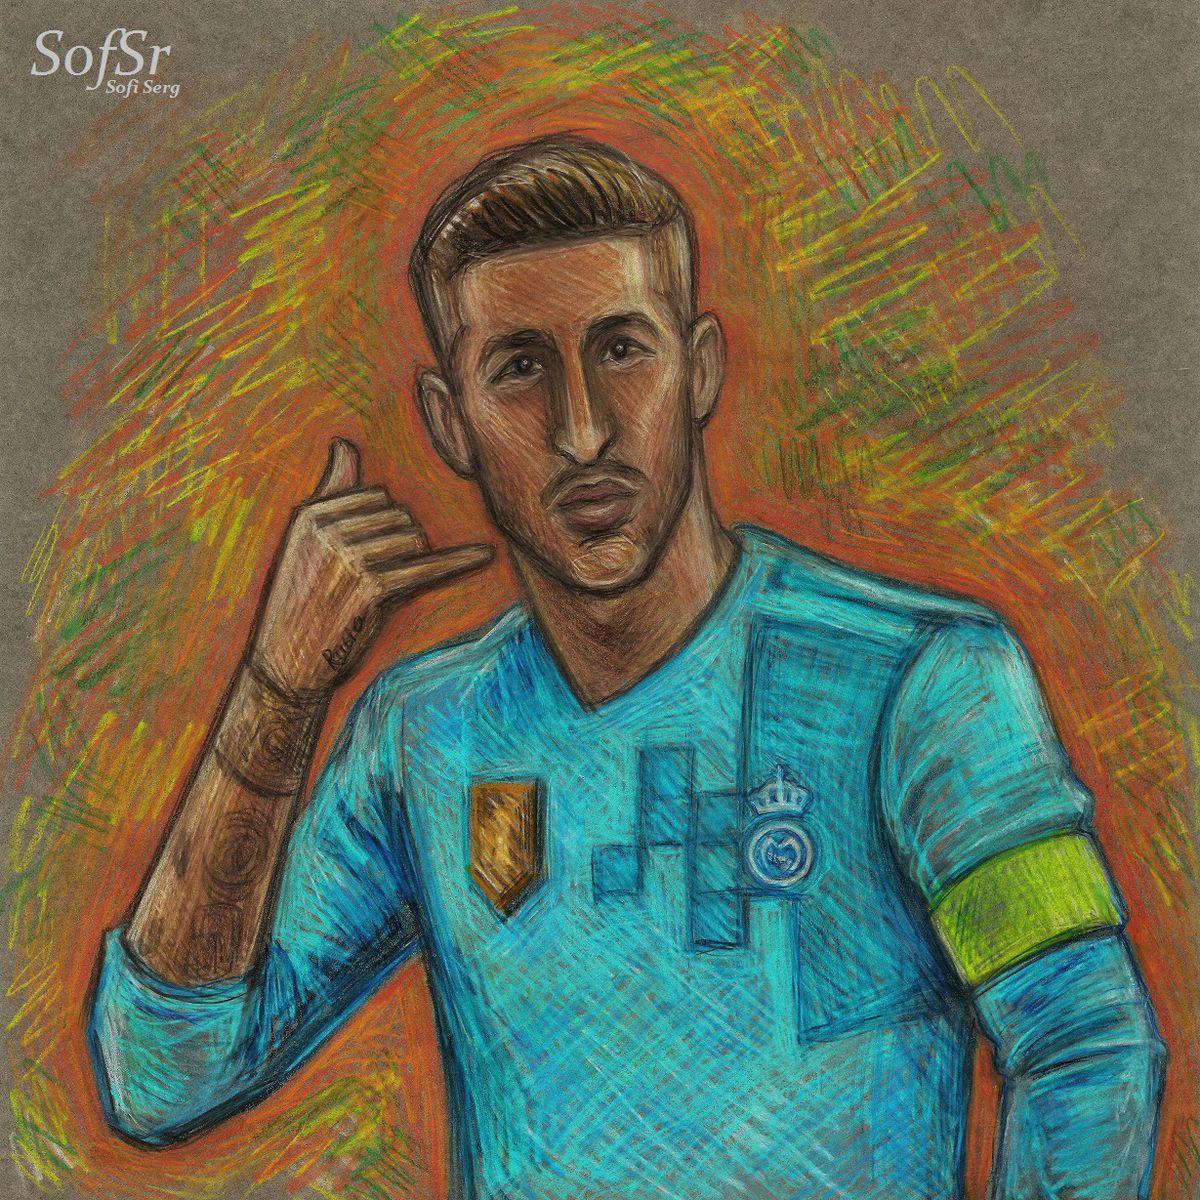 Sergio Ramos. Illustration by Sofi Serg.